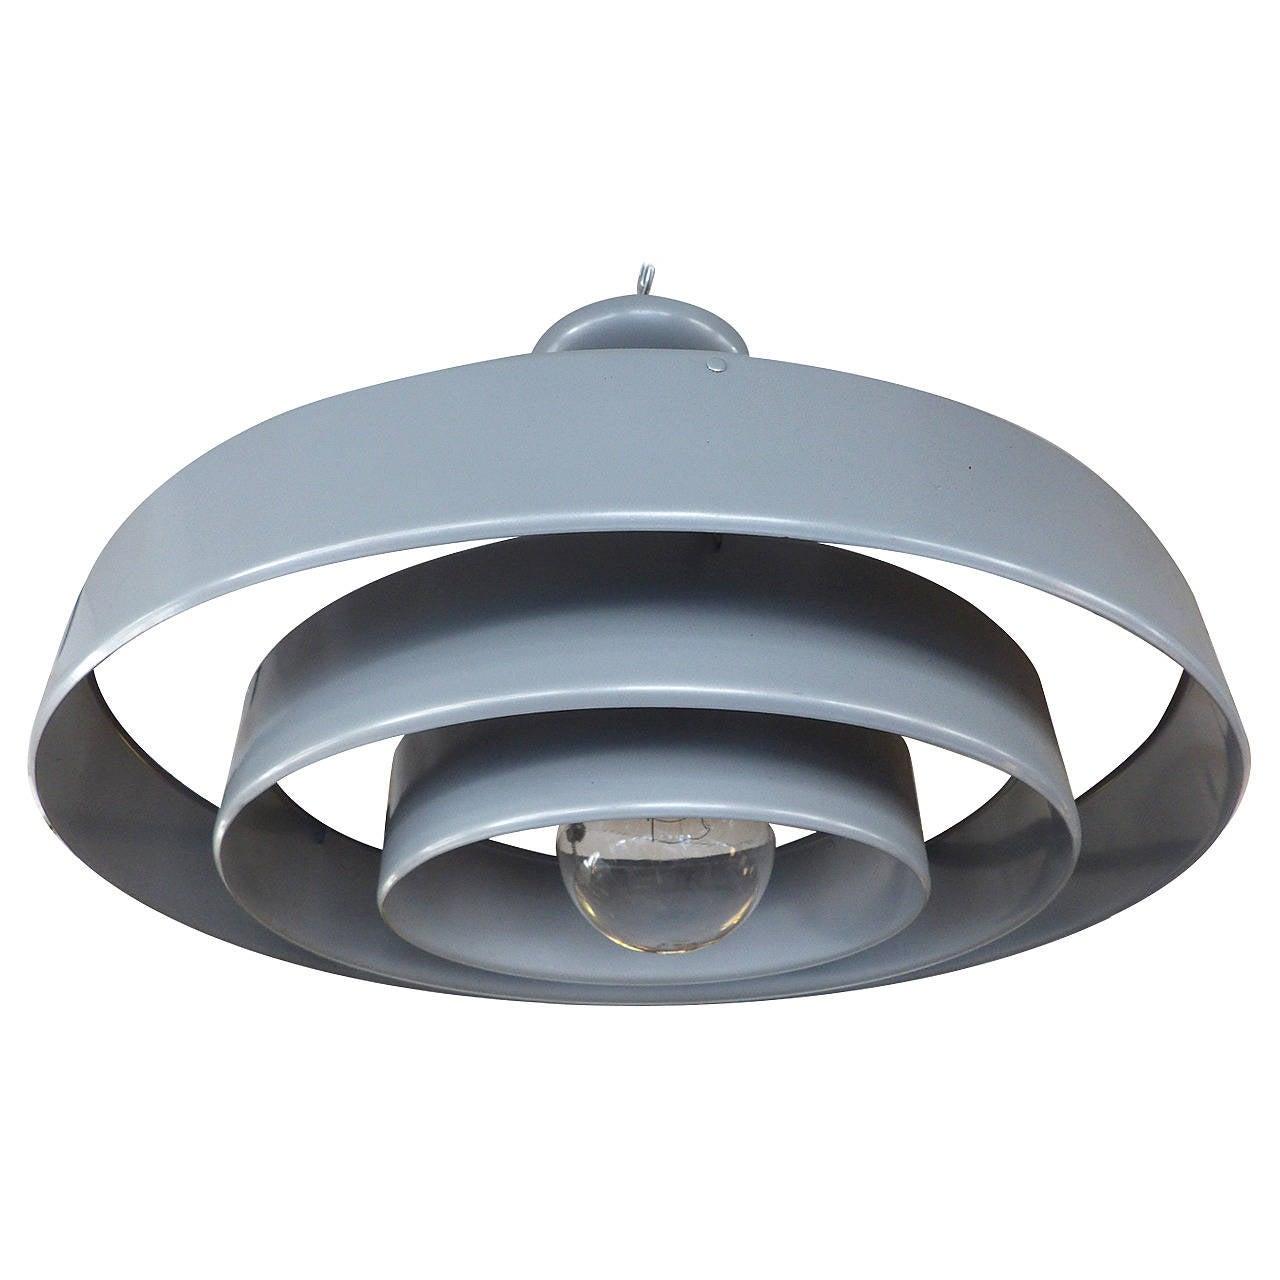 Steel lighting fixtures by prescolite at 1stdibs steel lighting fixtures by prescolite 1 arubaitofo Images